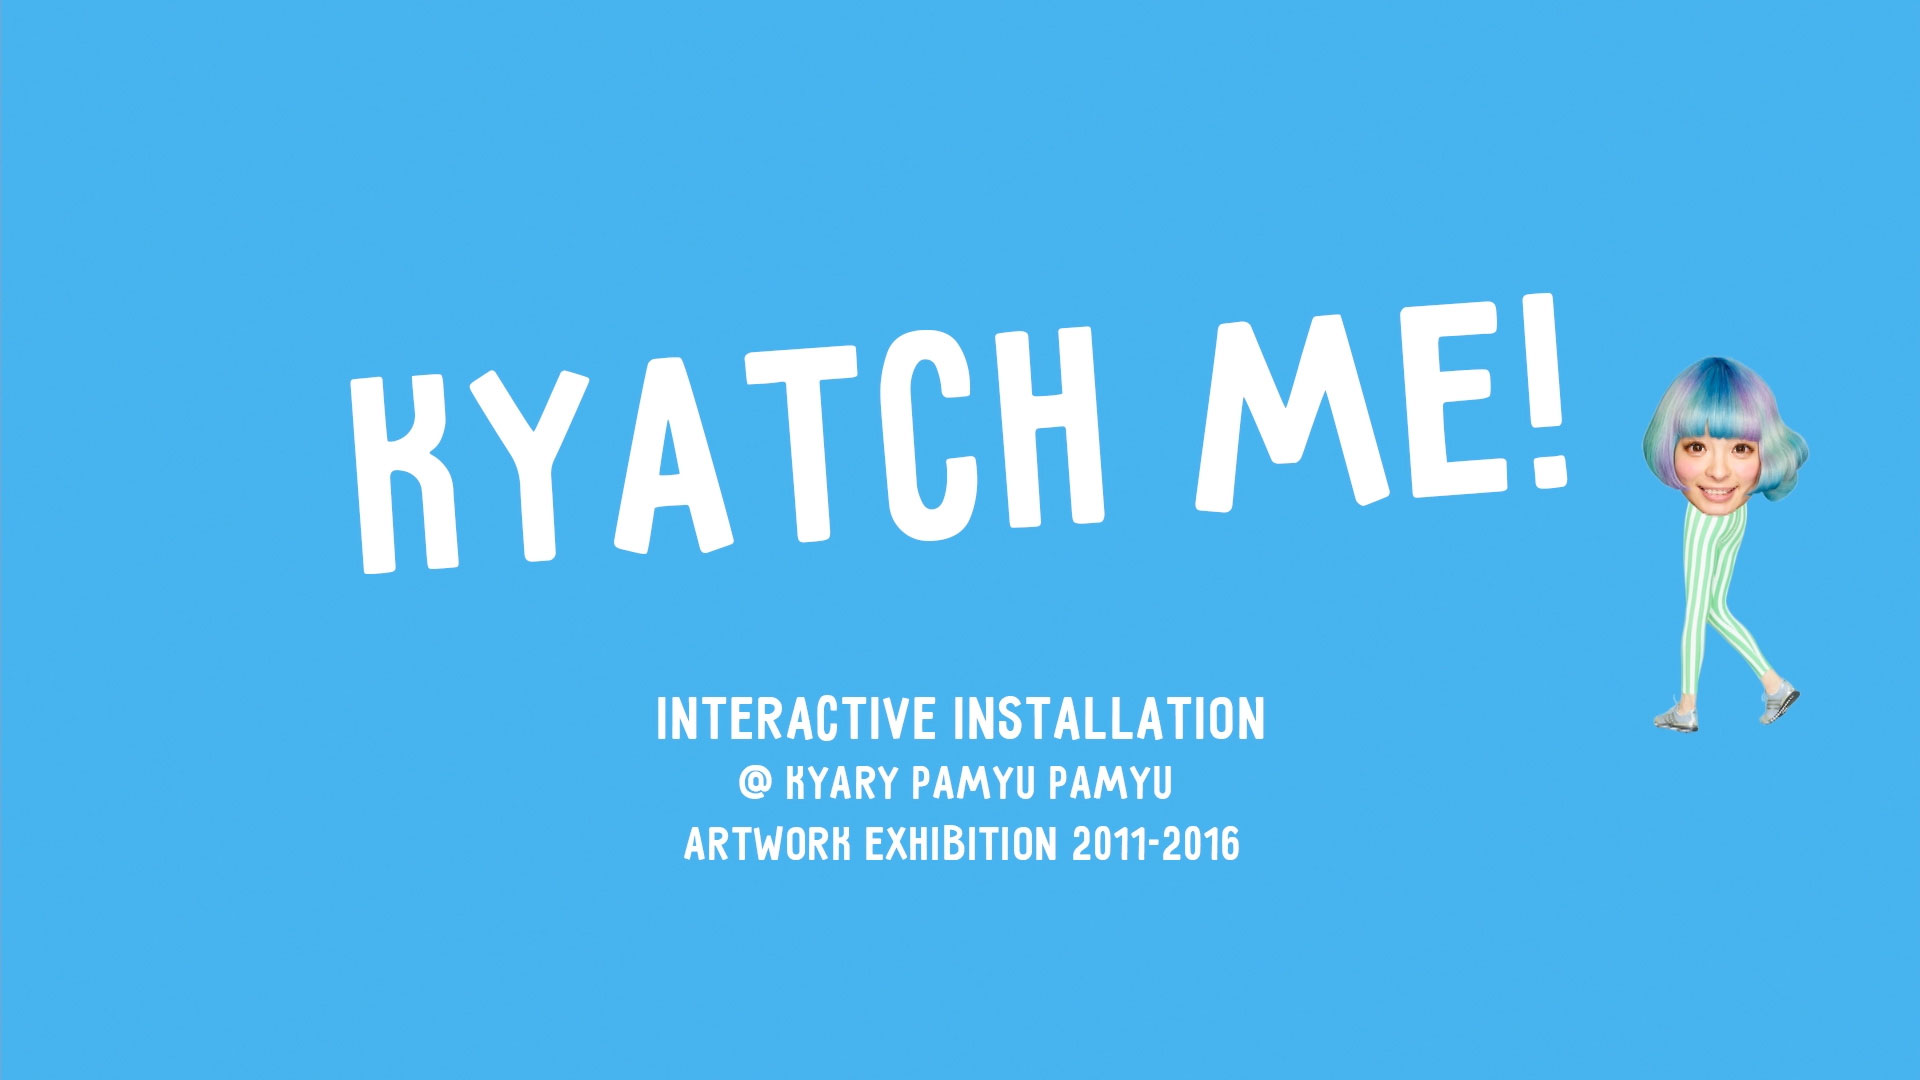 KYARY PAMYU PAMYU ARTWORK EXHIBITION 2011-2016